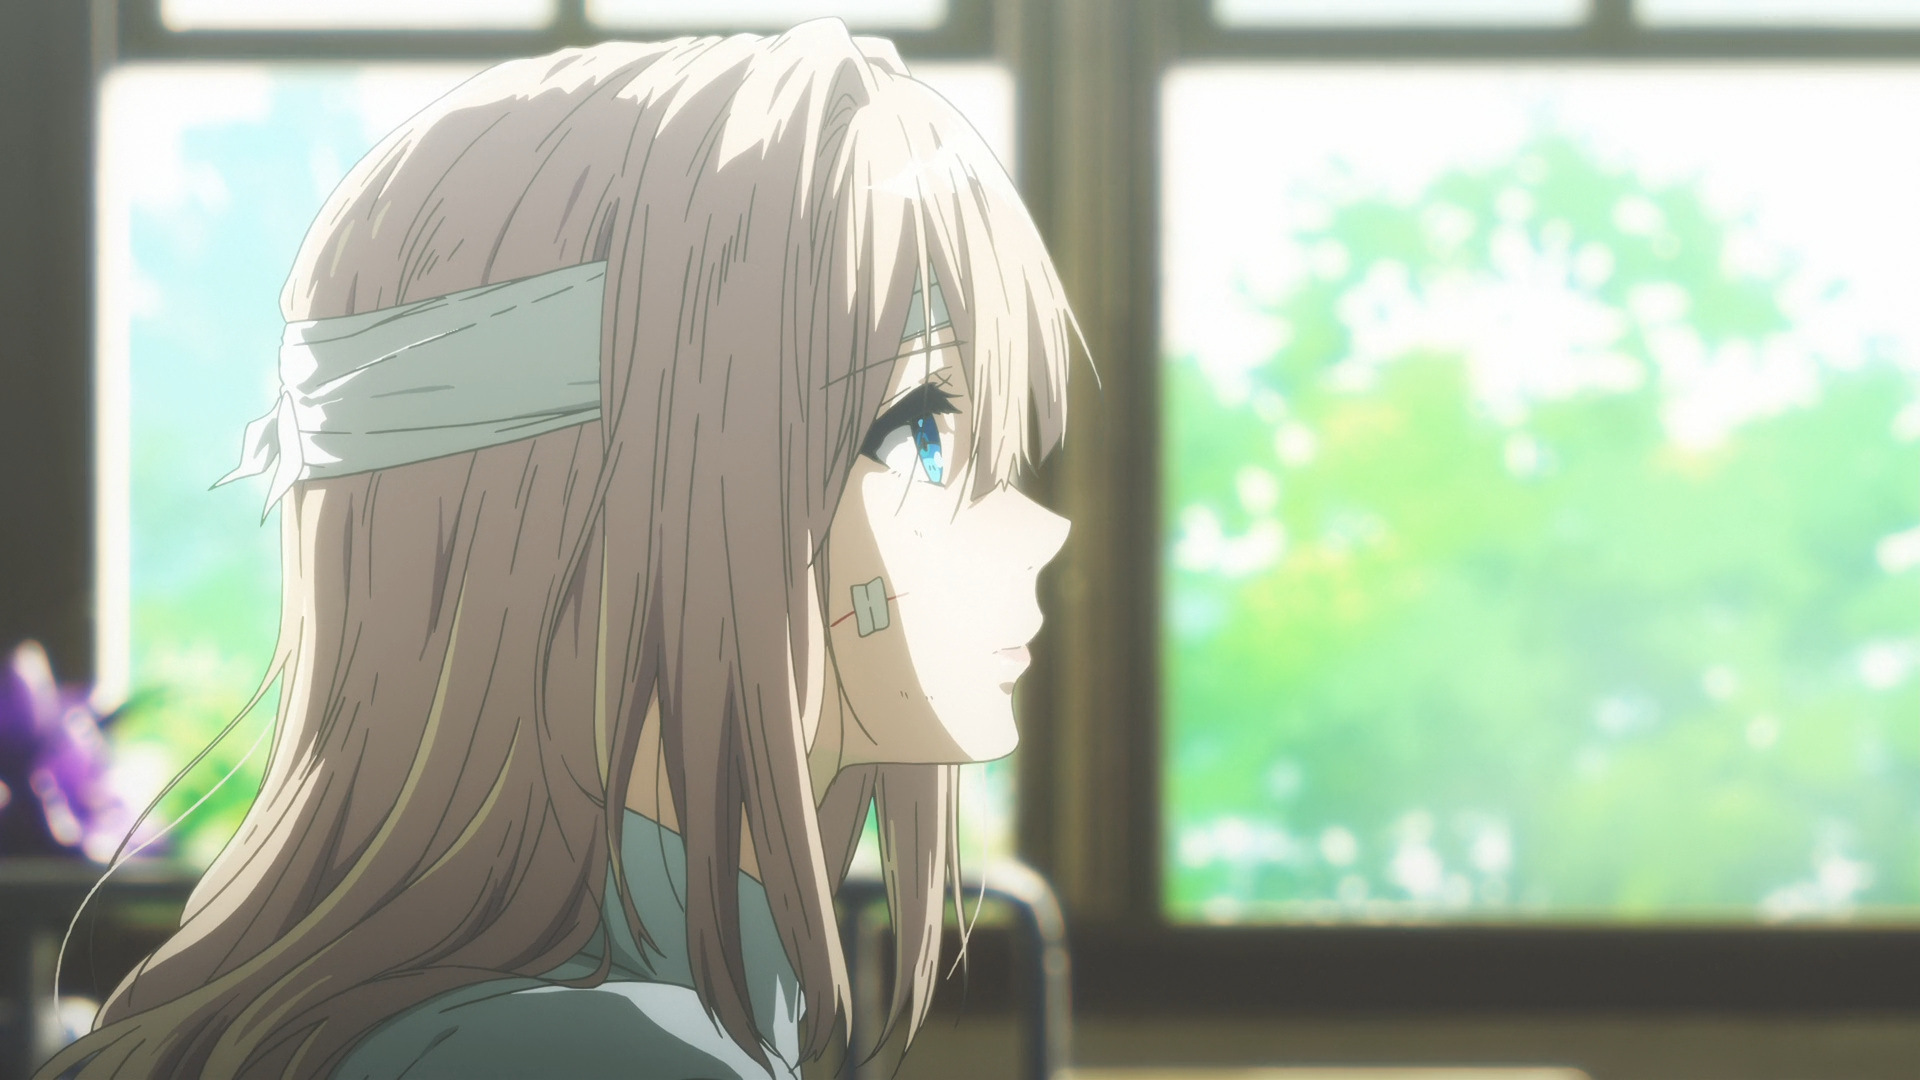 violet evergarden tv media review episode 1 anime solution